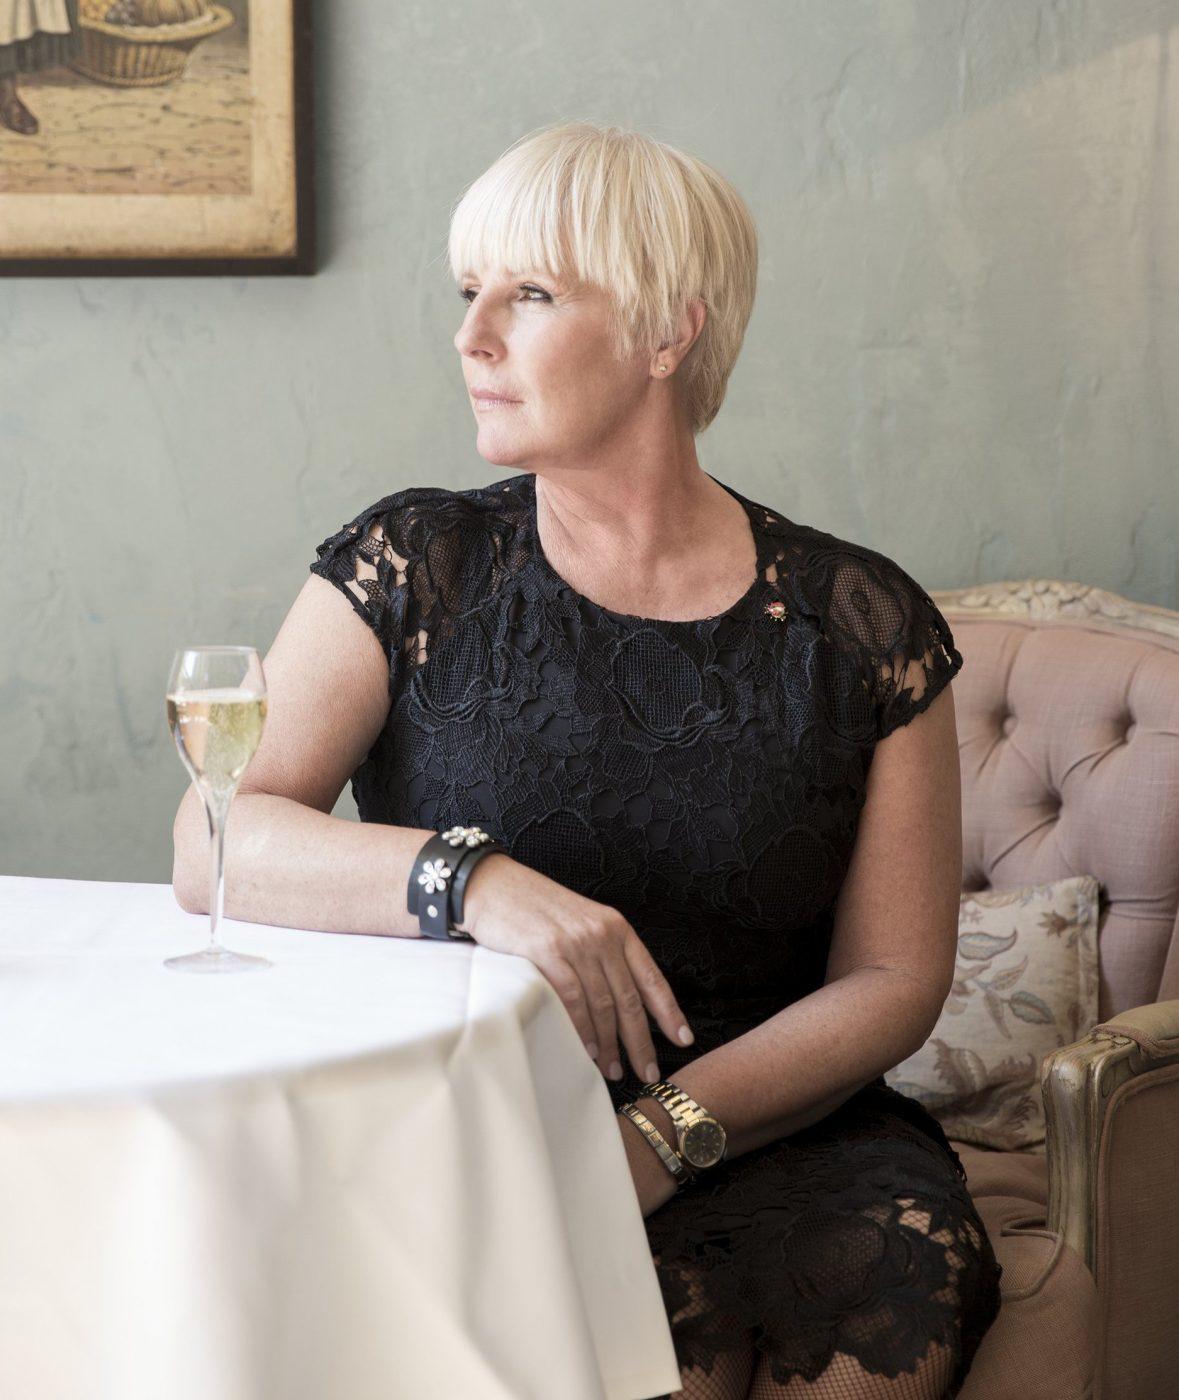 Lien Degol Fabulous 50 (c) Dirk Alexander Photography